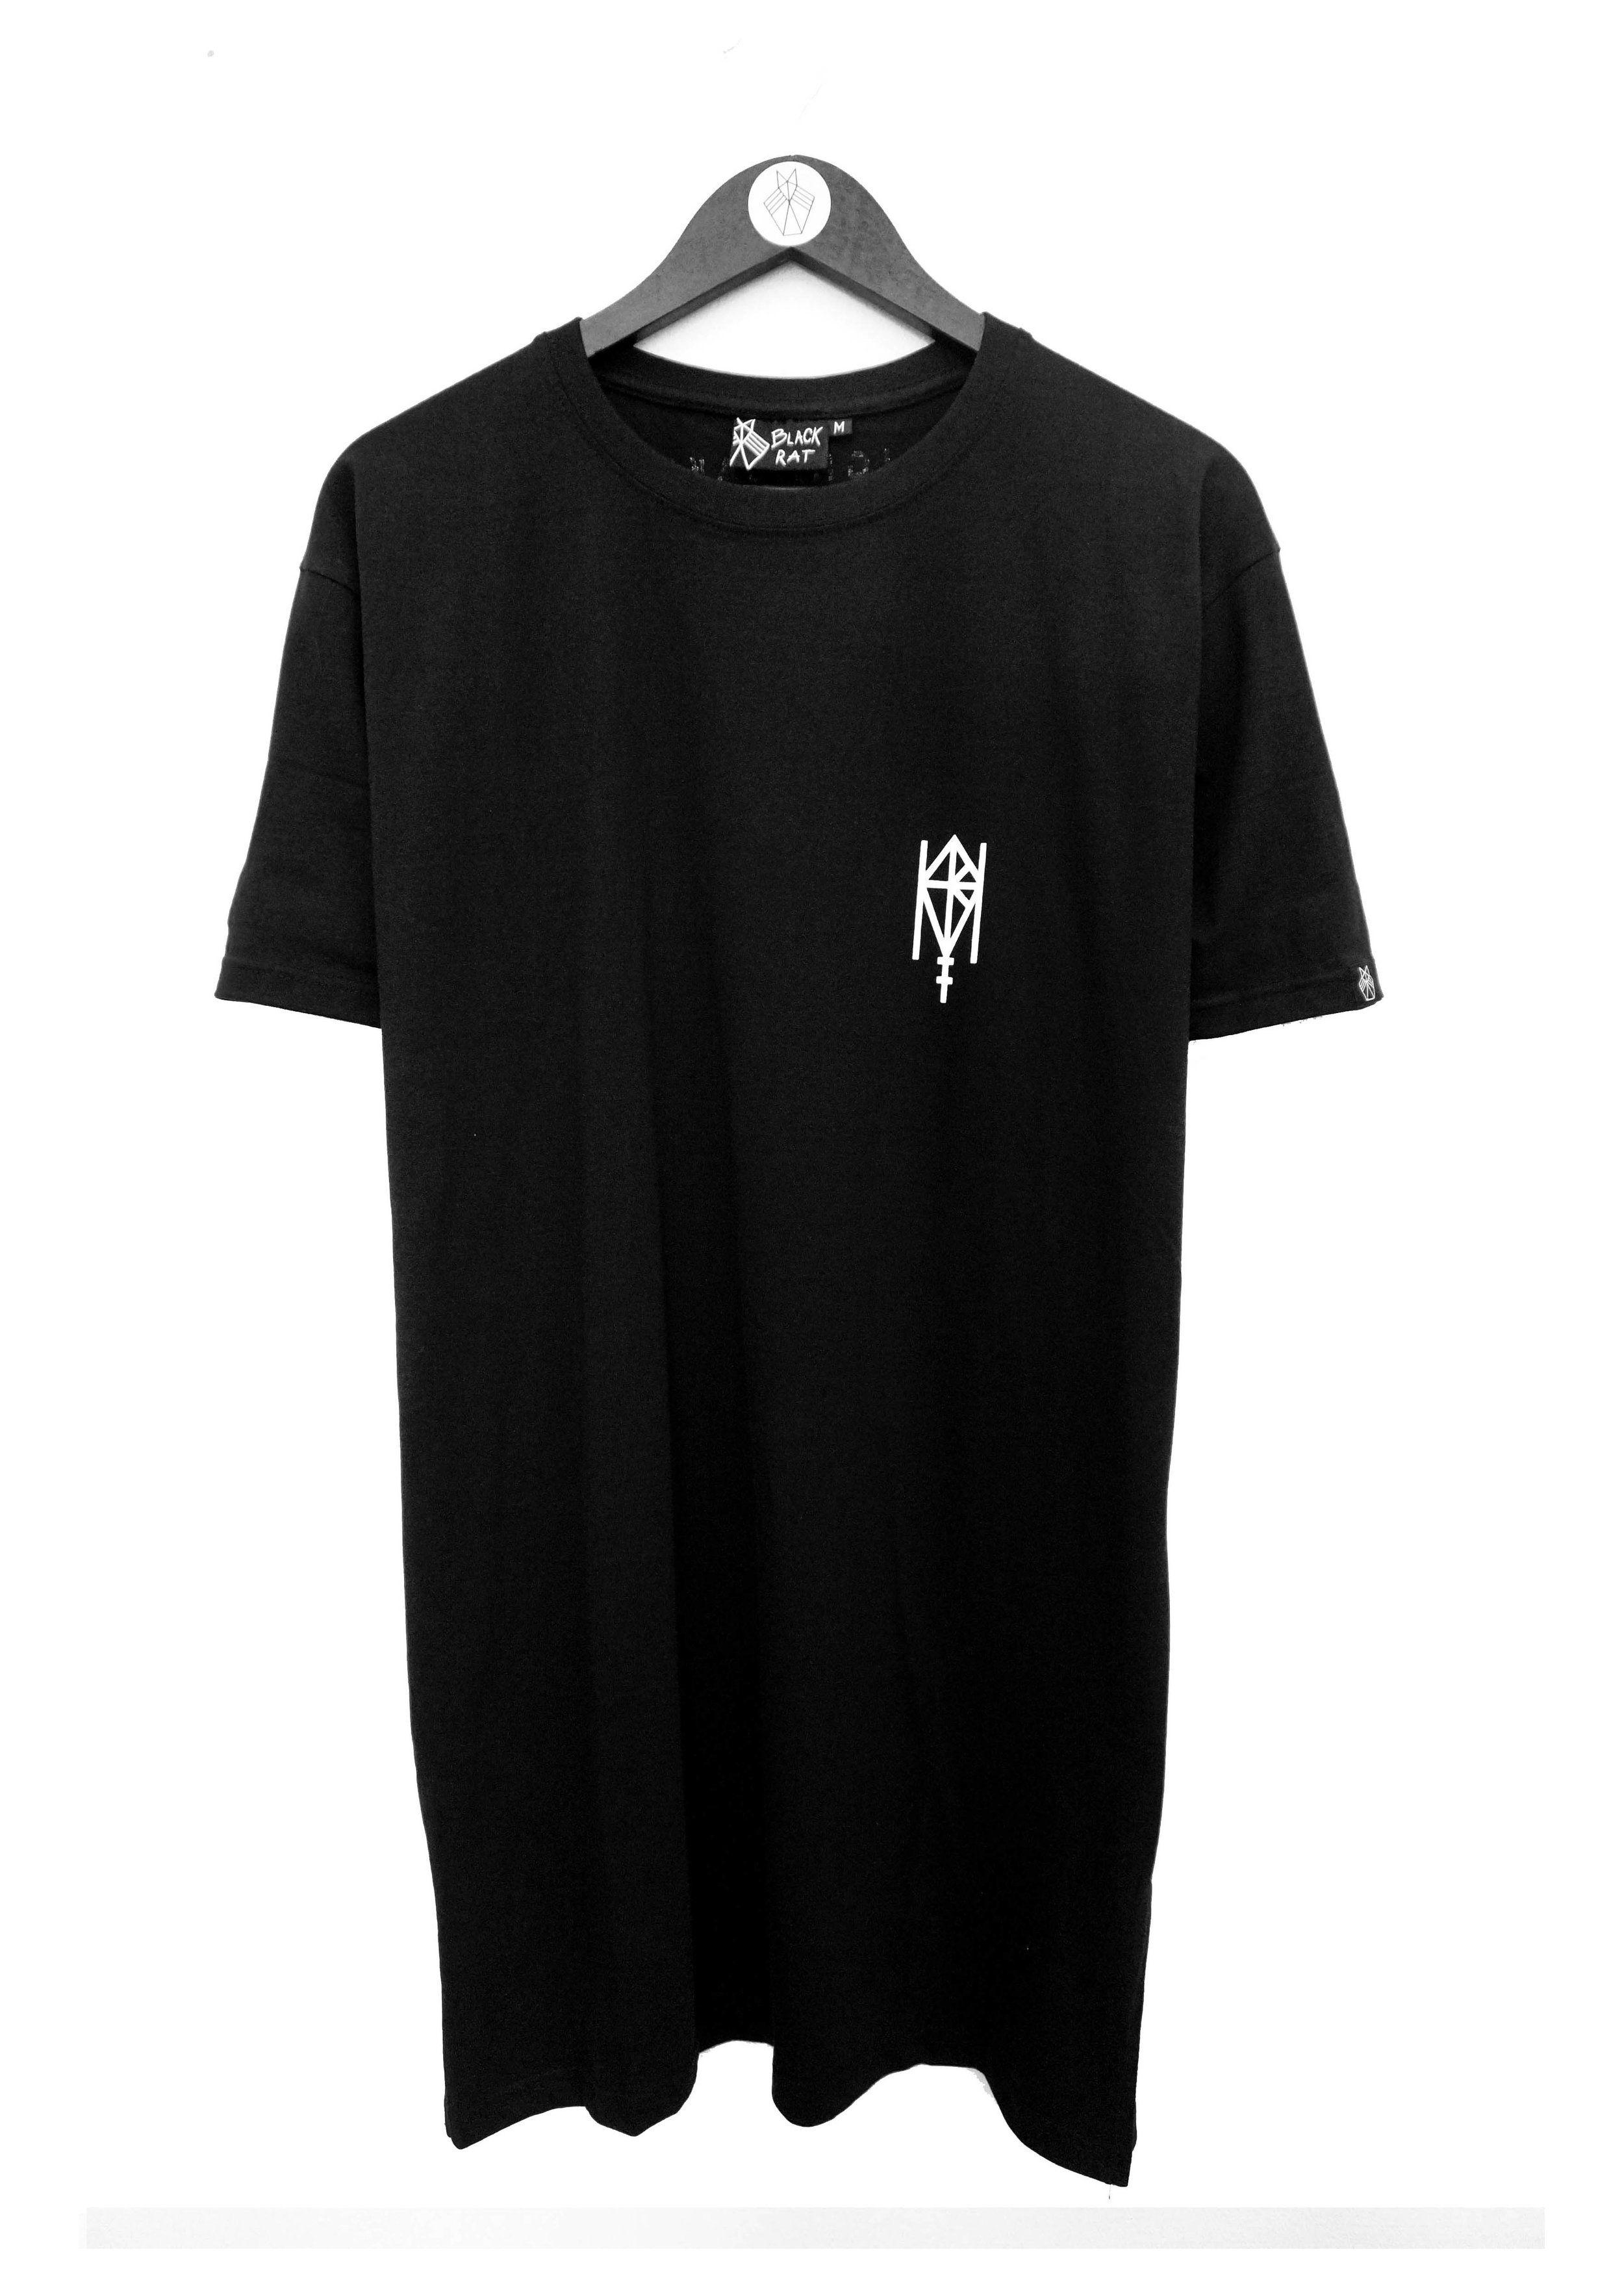 Long t-shirt with print, merch from the Norwegian band Highasakite. Made by: Black Rat Clothing - Oslo. Designer Siri Sveen Haaland.